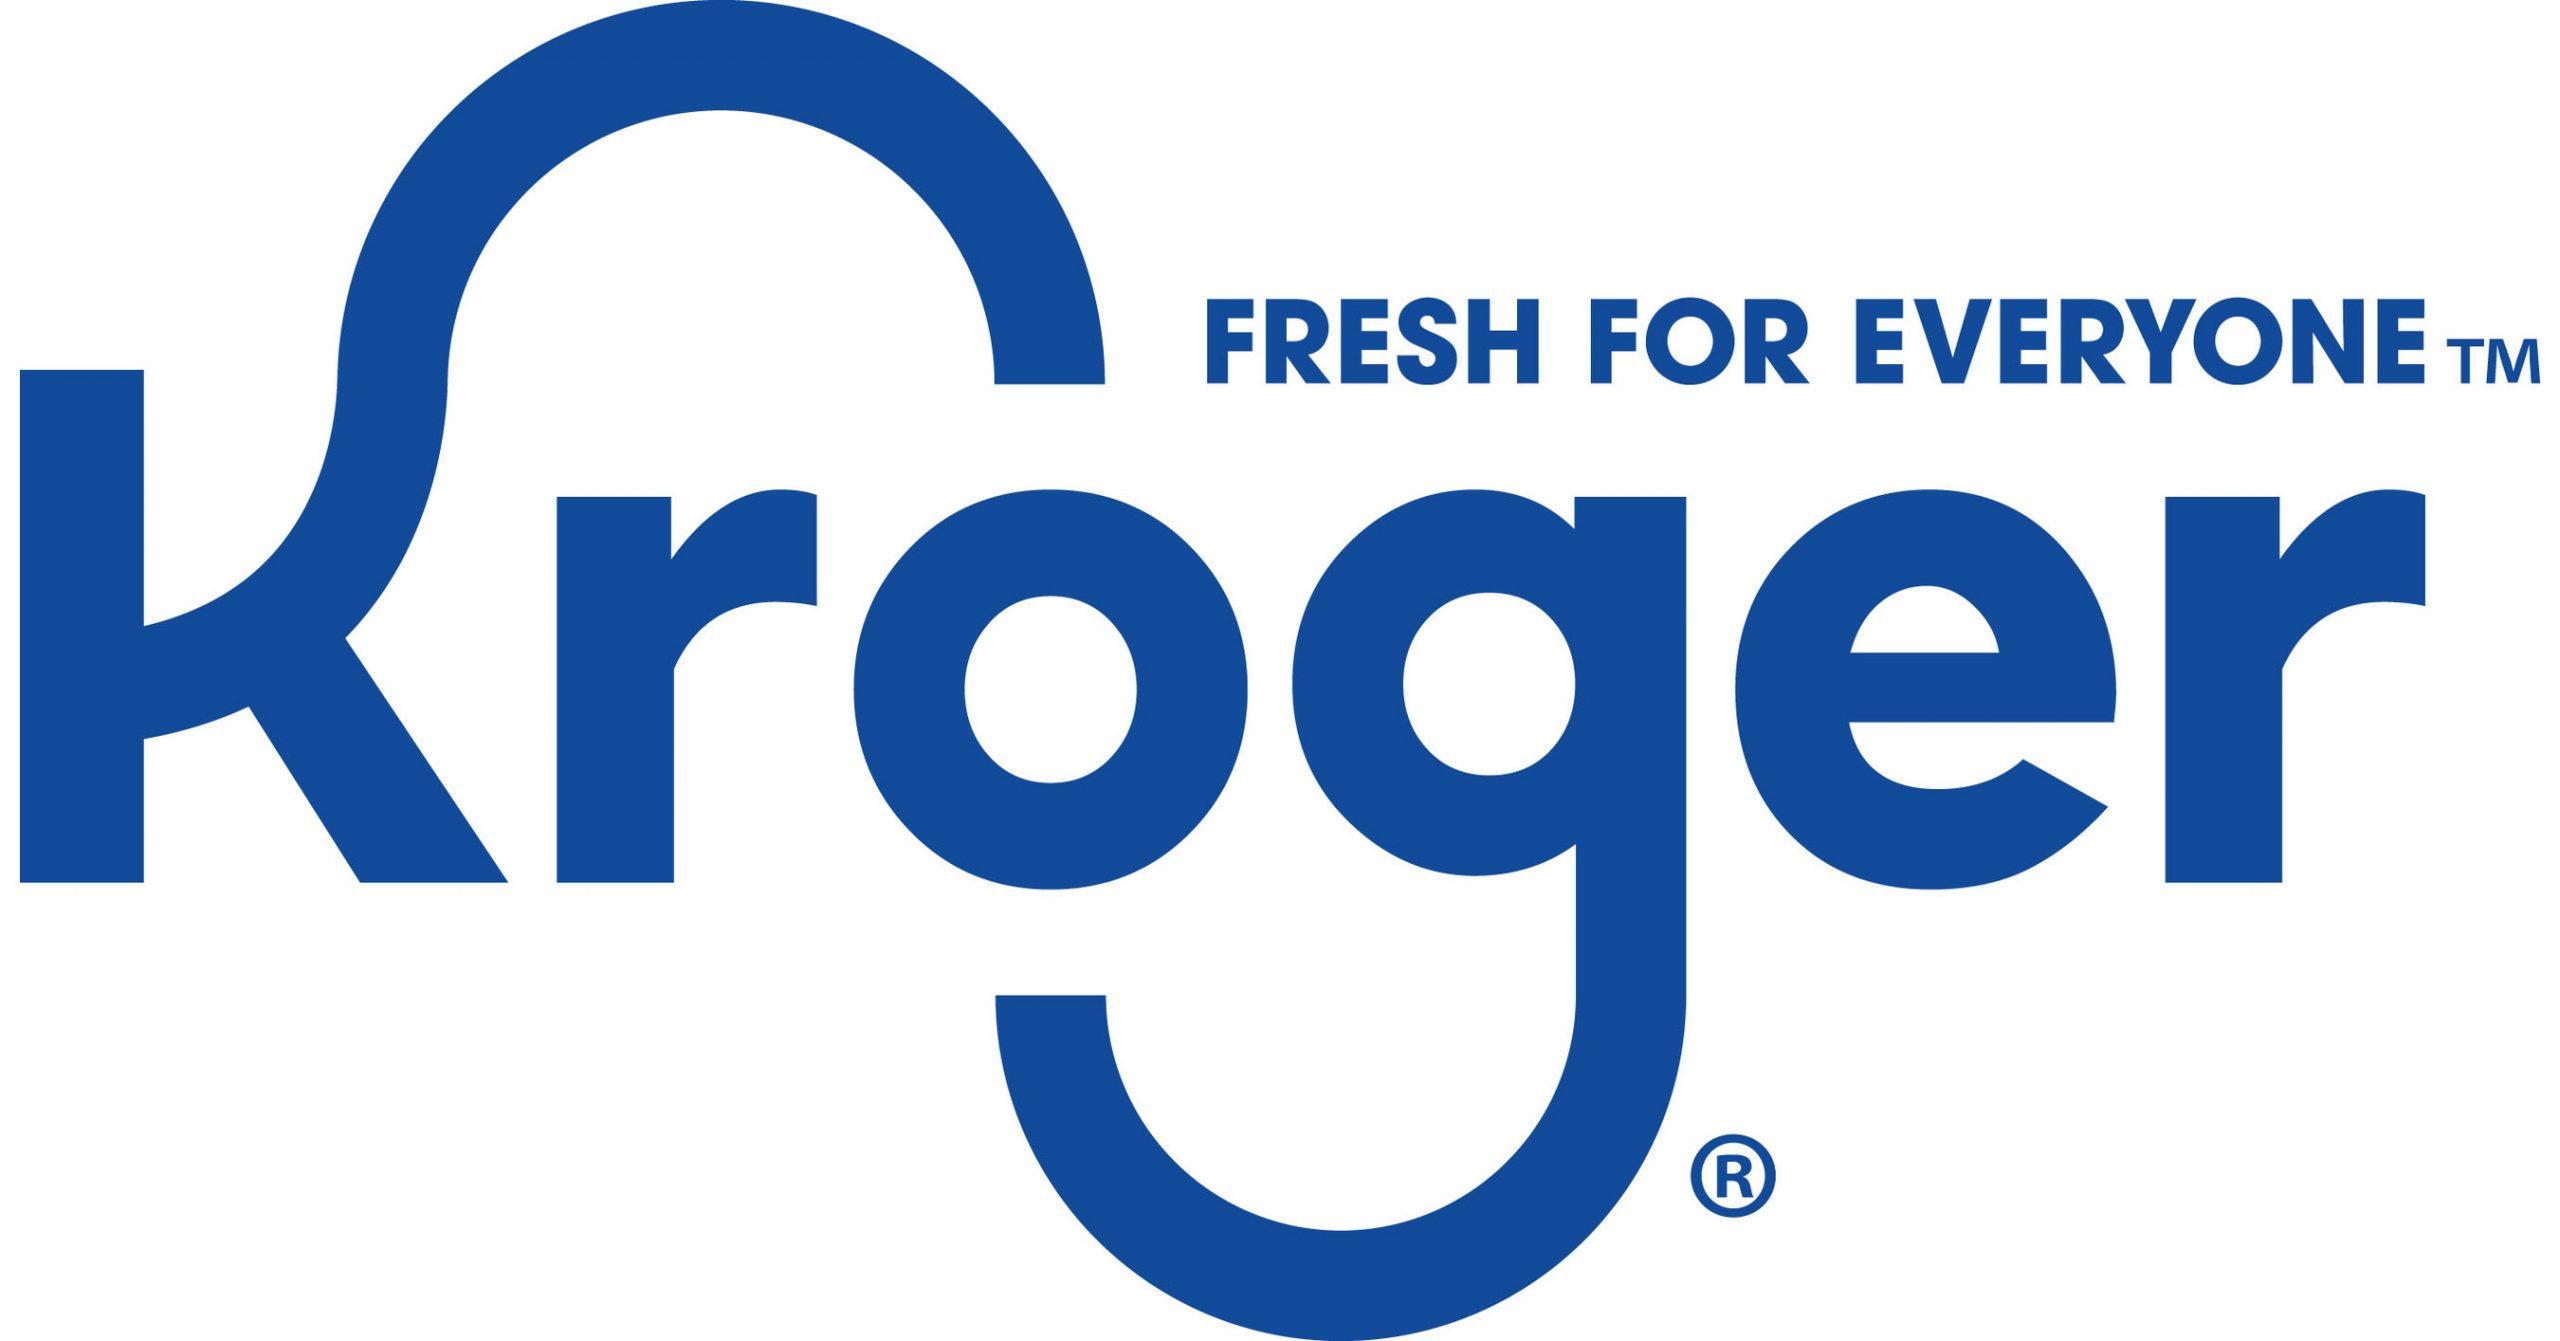 Kroger - fresh for everyone